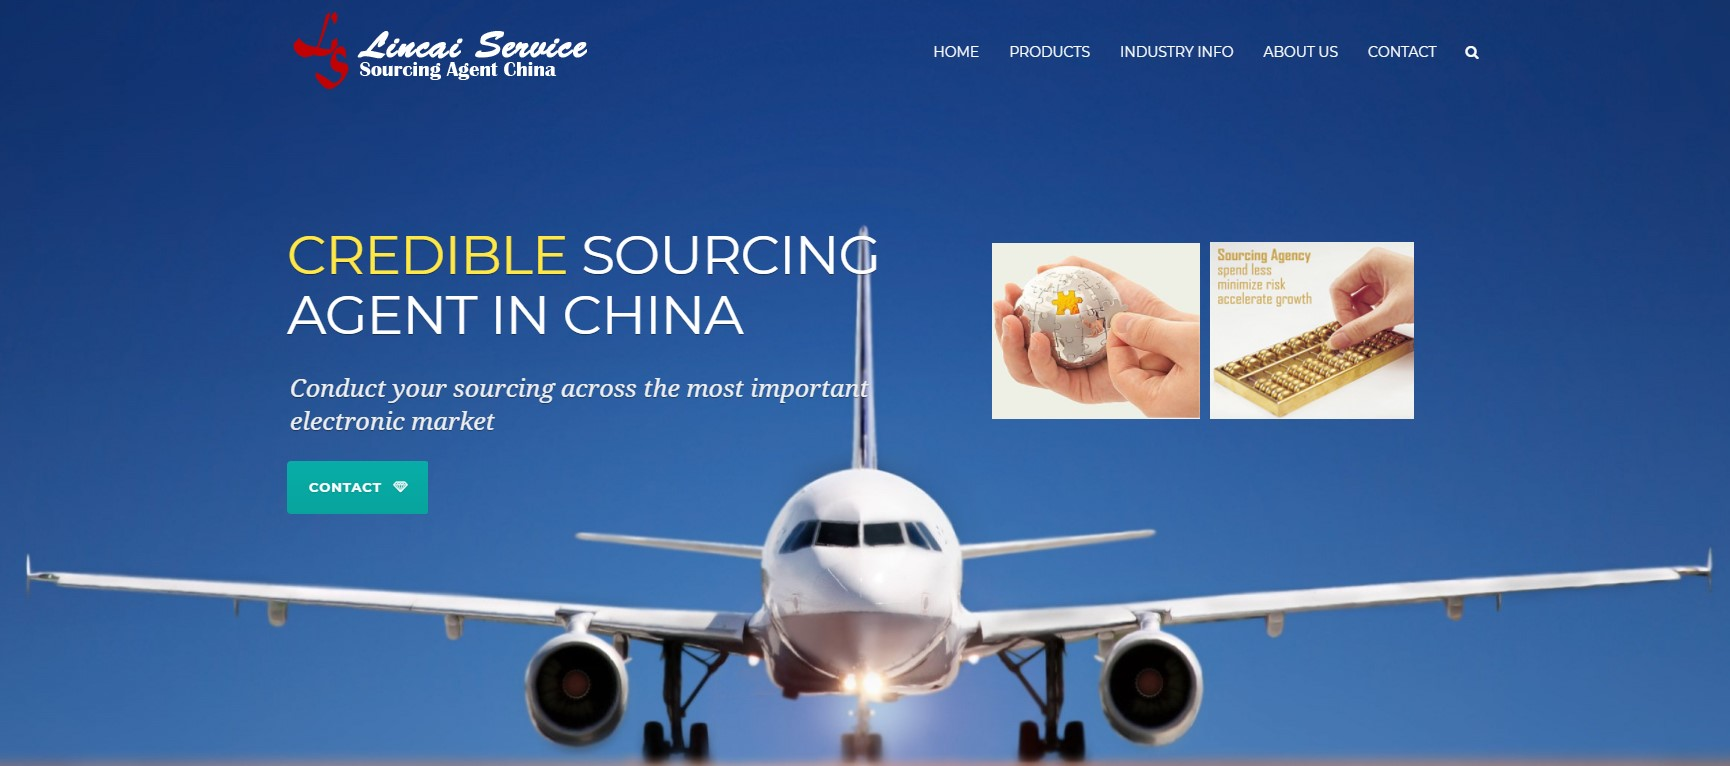 lincaiservices-sourcing-shenzhen agent